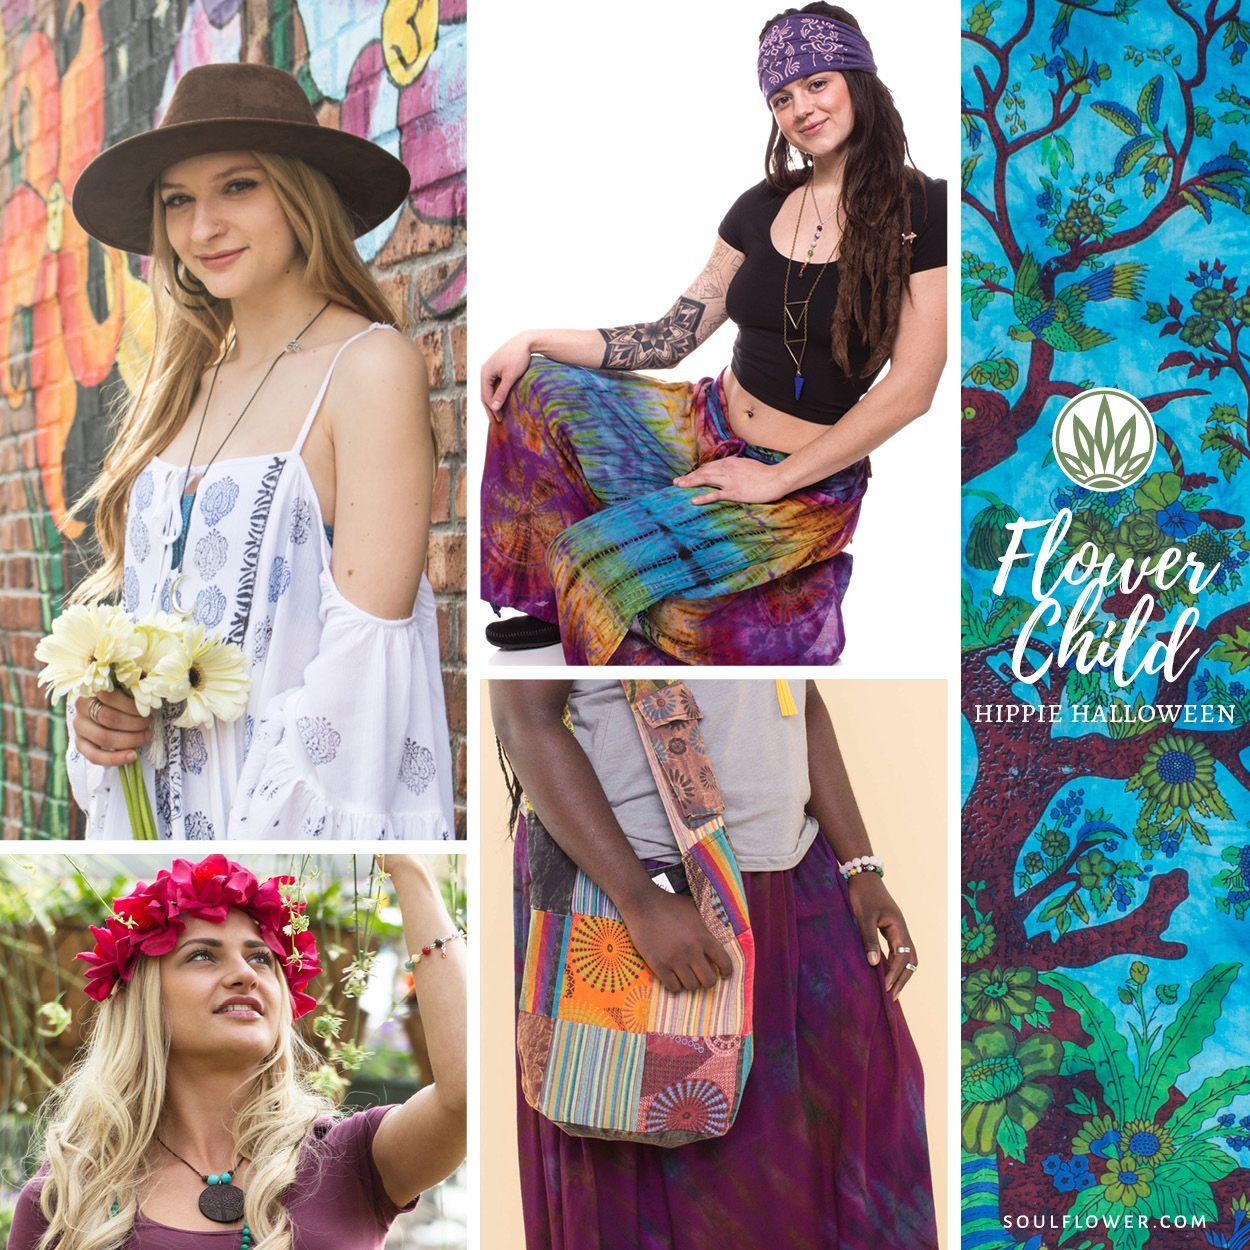 Hippie Outfits Diy Hippie Outfit Ideas Soul Flower Blog Tie Dye Dress Diy Diy Summer Clothes Hippie Costume Diy